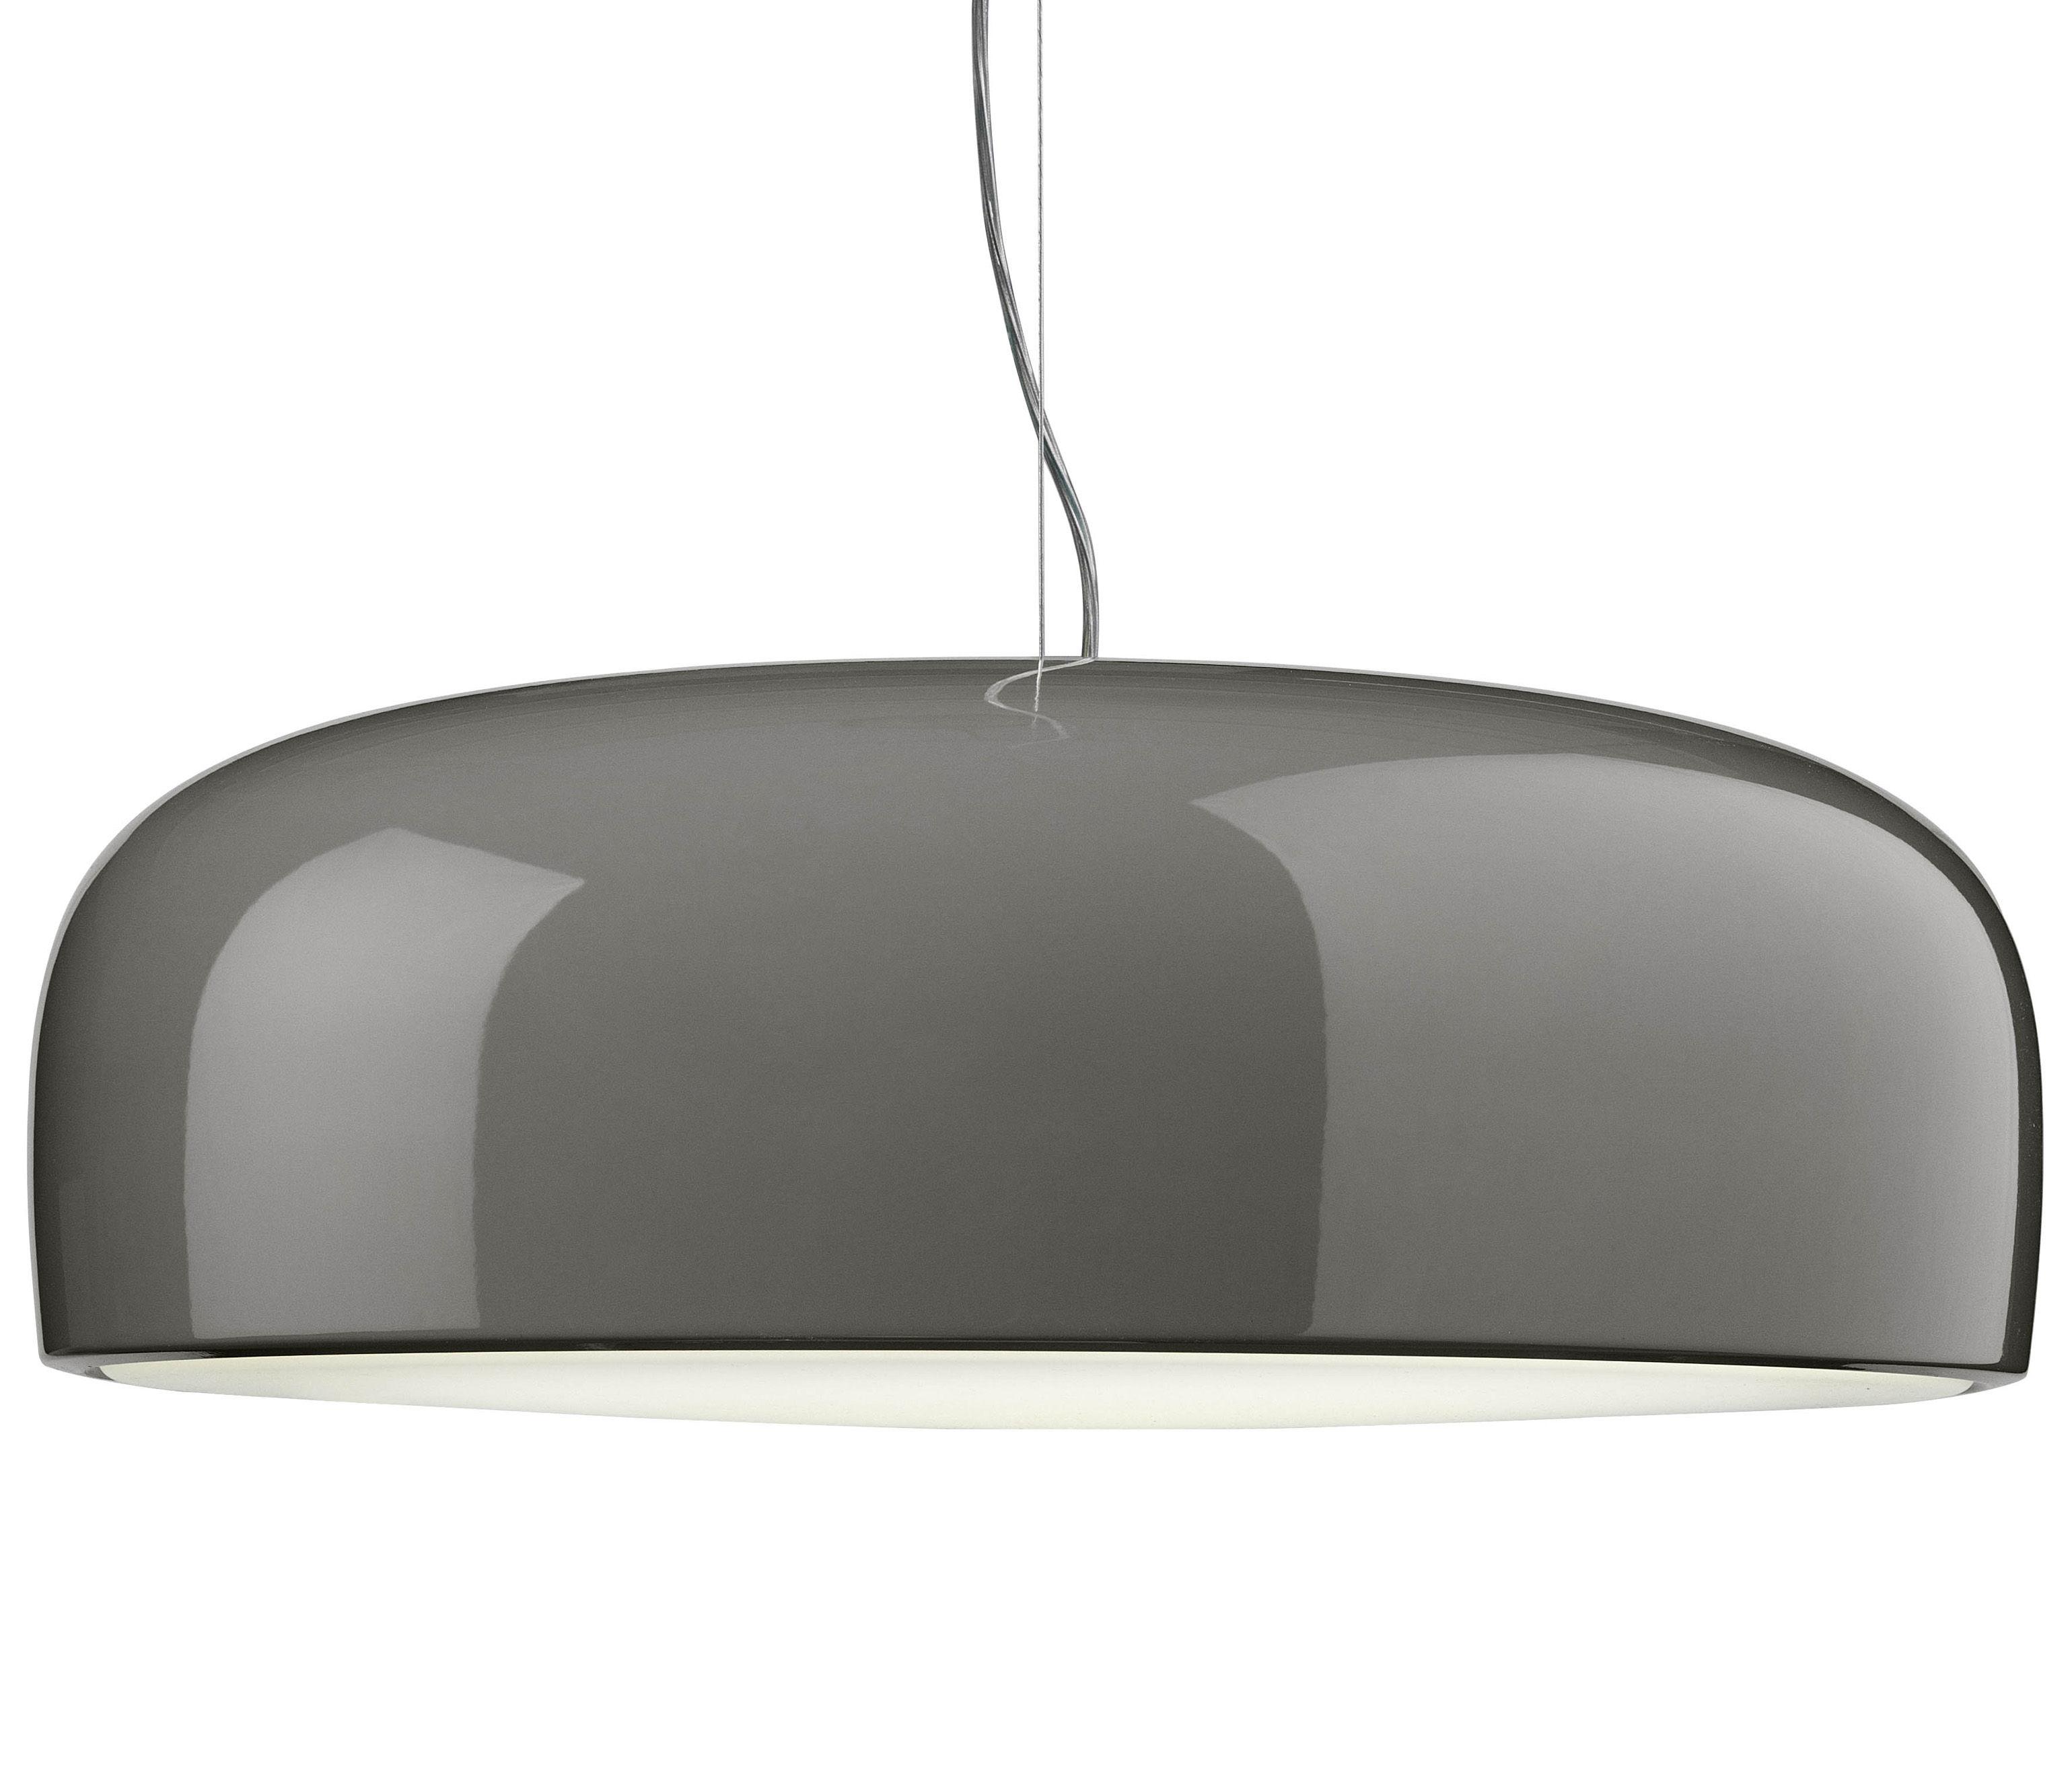 Leuchten - Pendelleuchten - Smithfield Pendelleuchte - Flos - Halogenlampe - Grau-taupe - bemaltes Aluminium, Polykarbonat